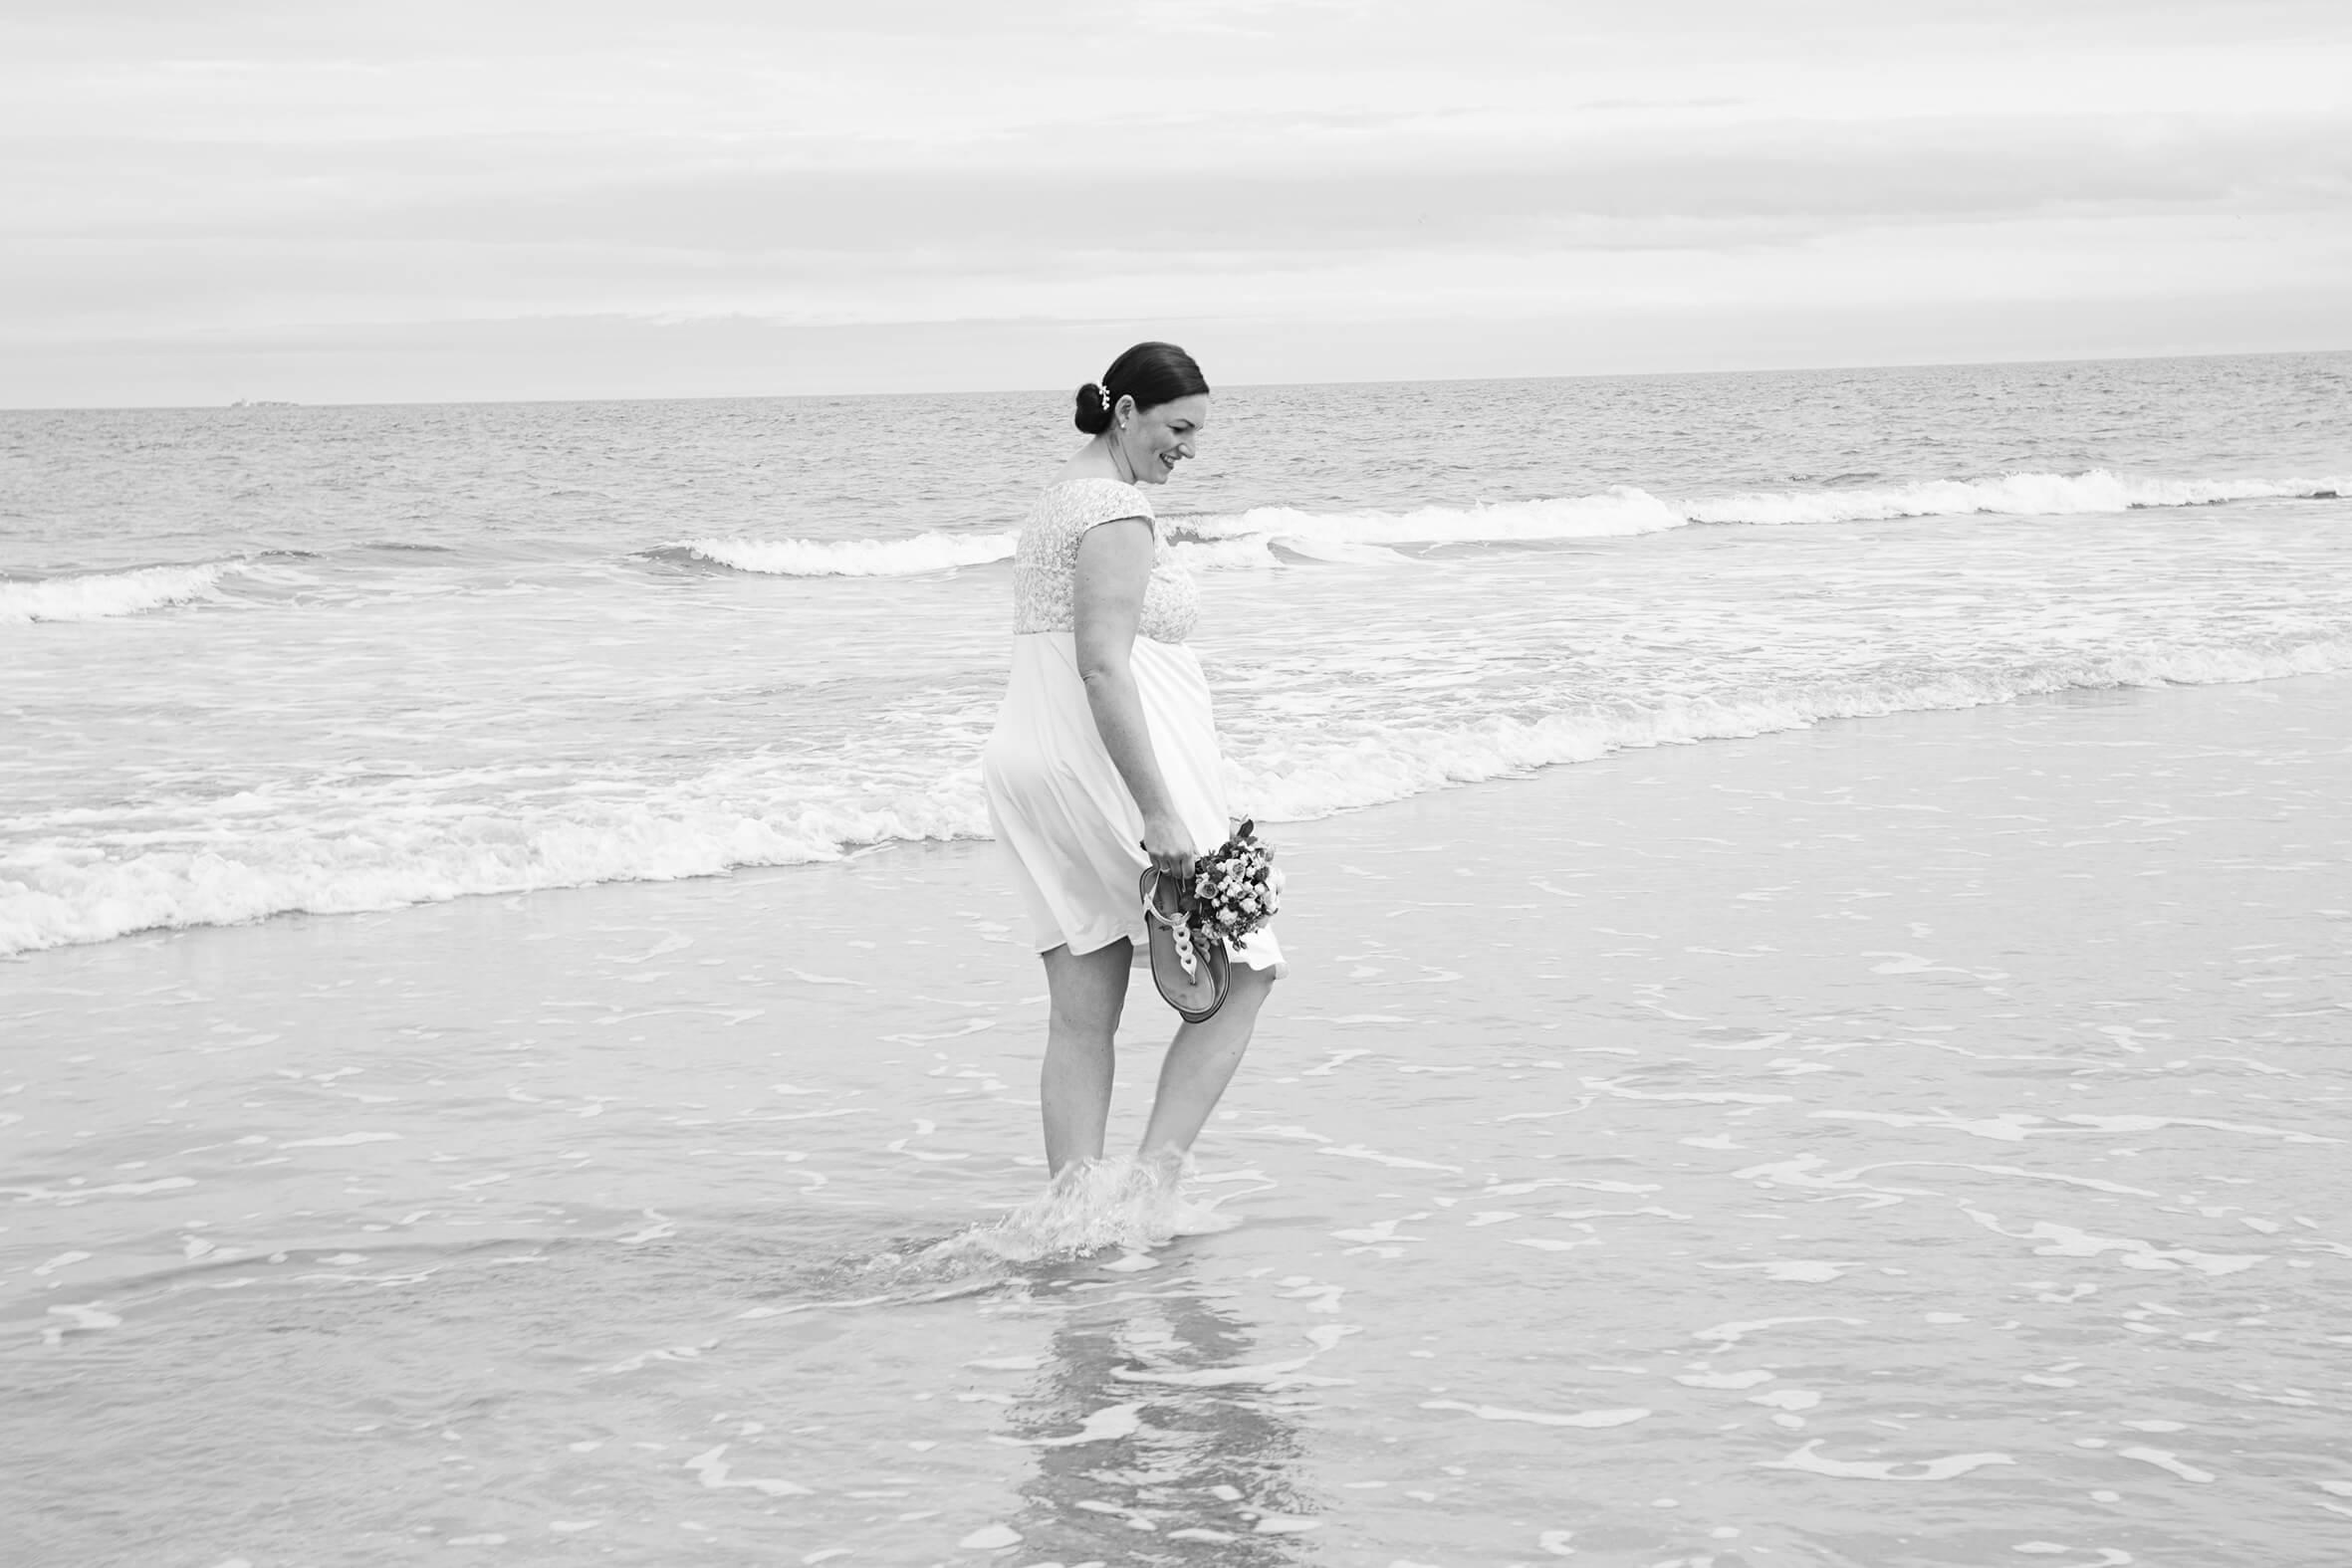 Janine Rahn, rahnphotography